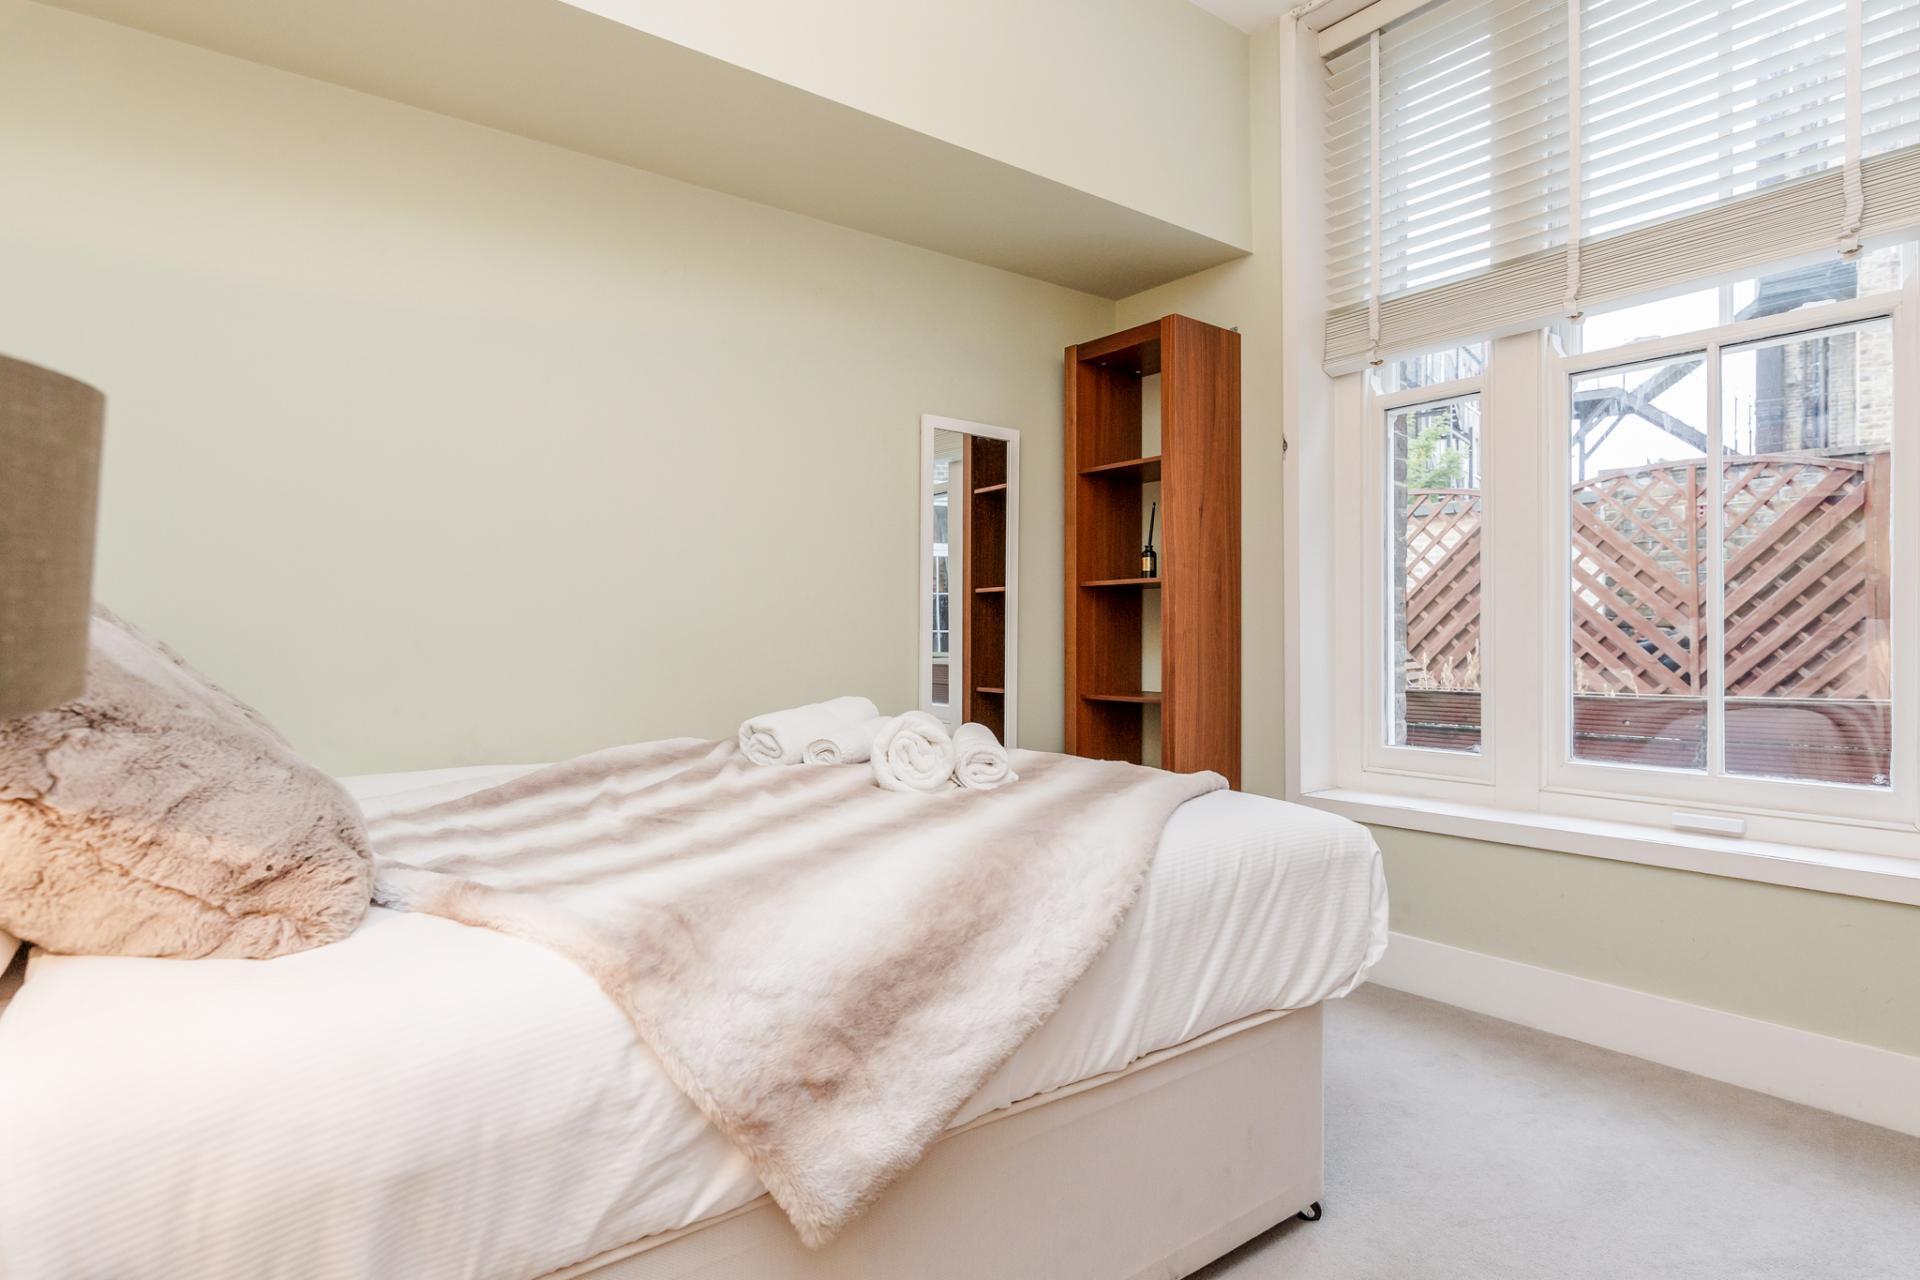 Double bed at Eden Close Apartment, Kensington, London - Citybase Apartments